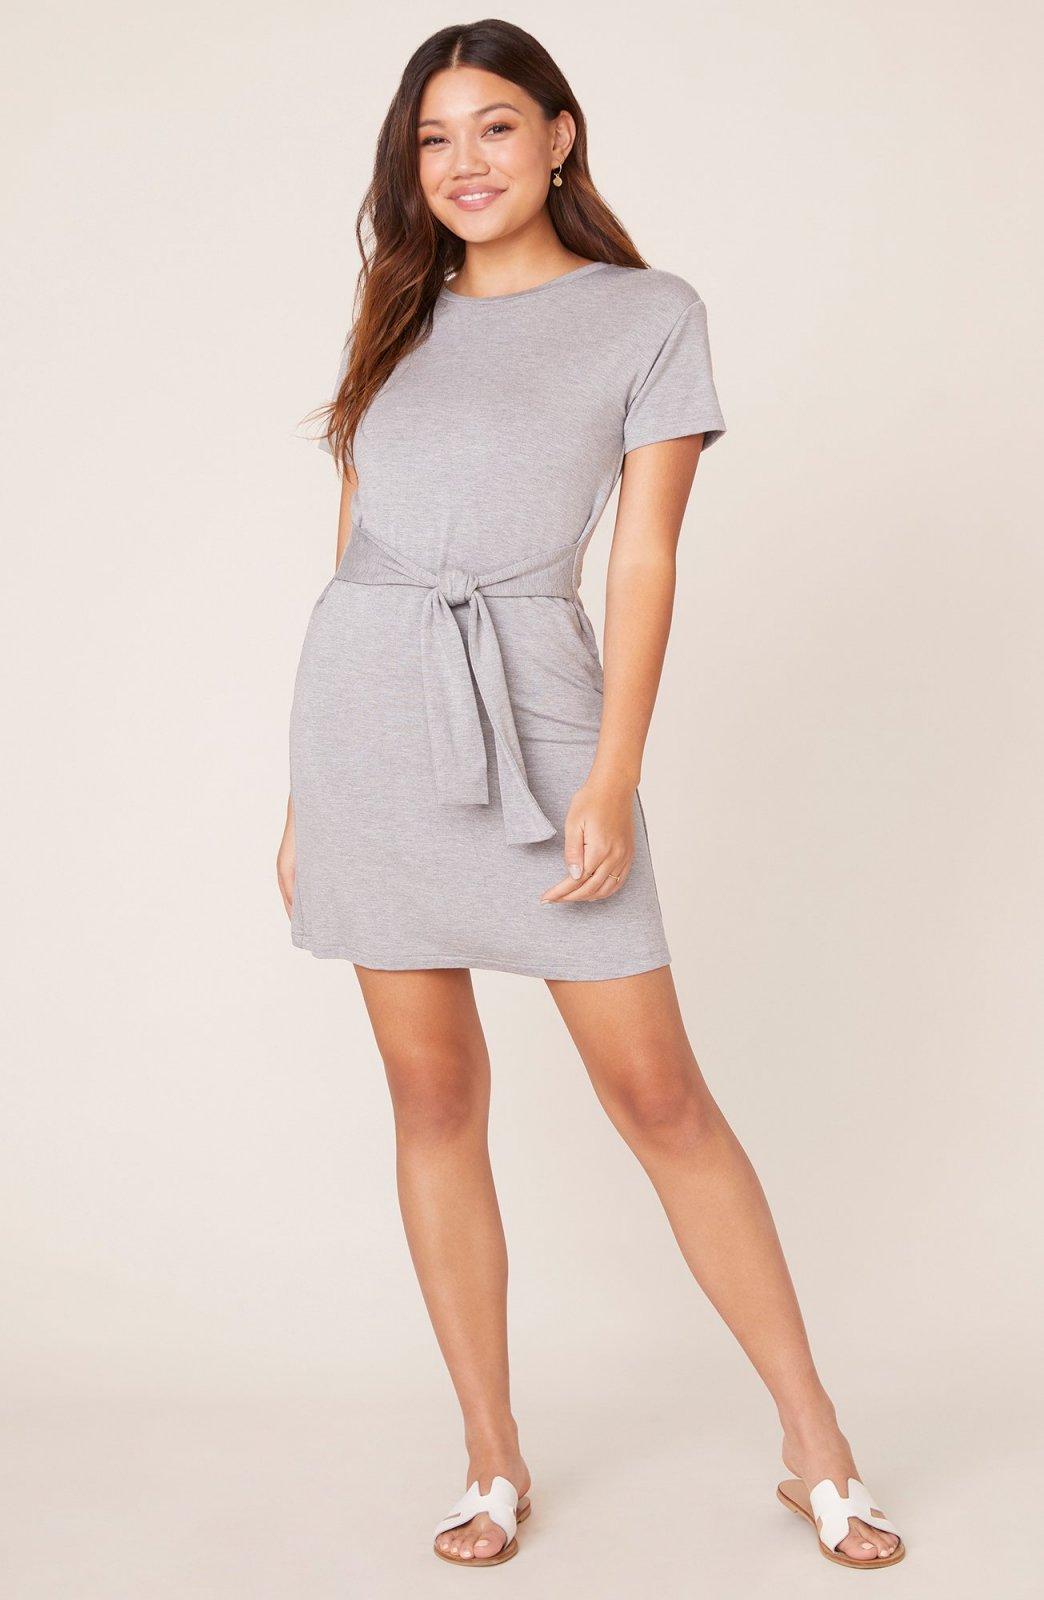 BB Dakota Sunrise Tie Front Grey Dress